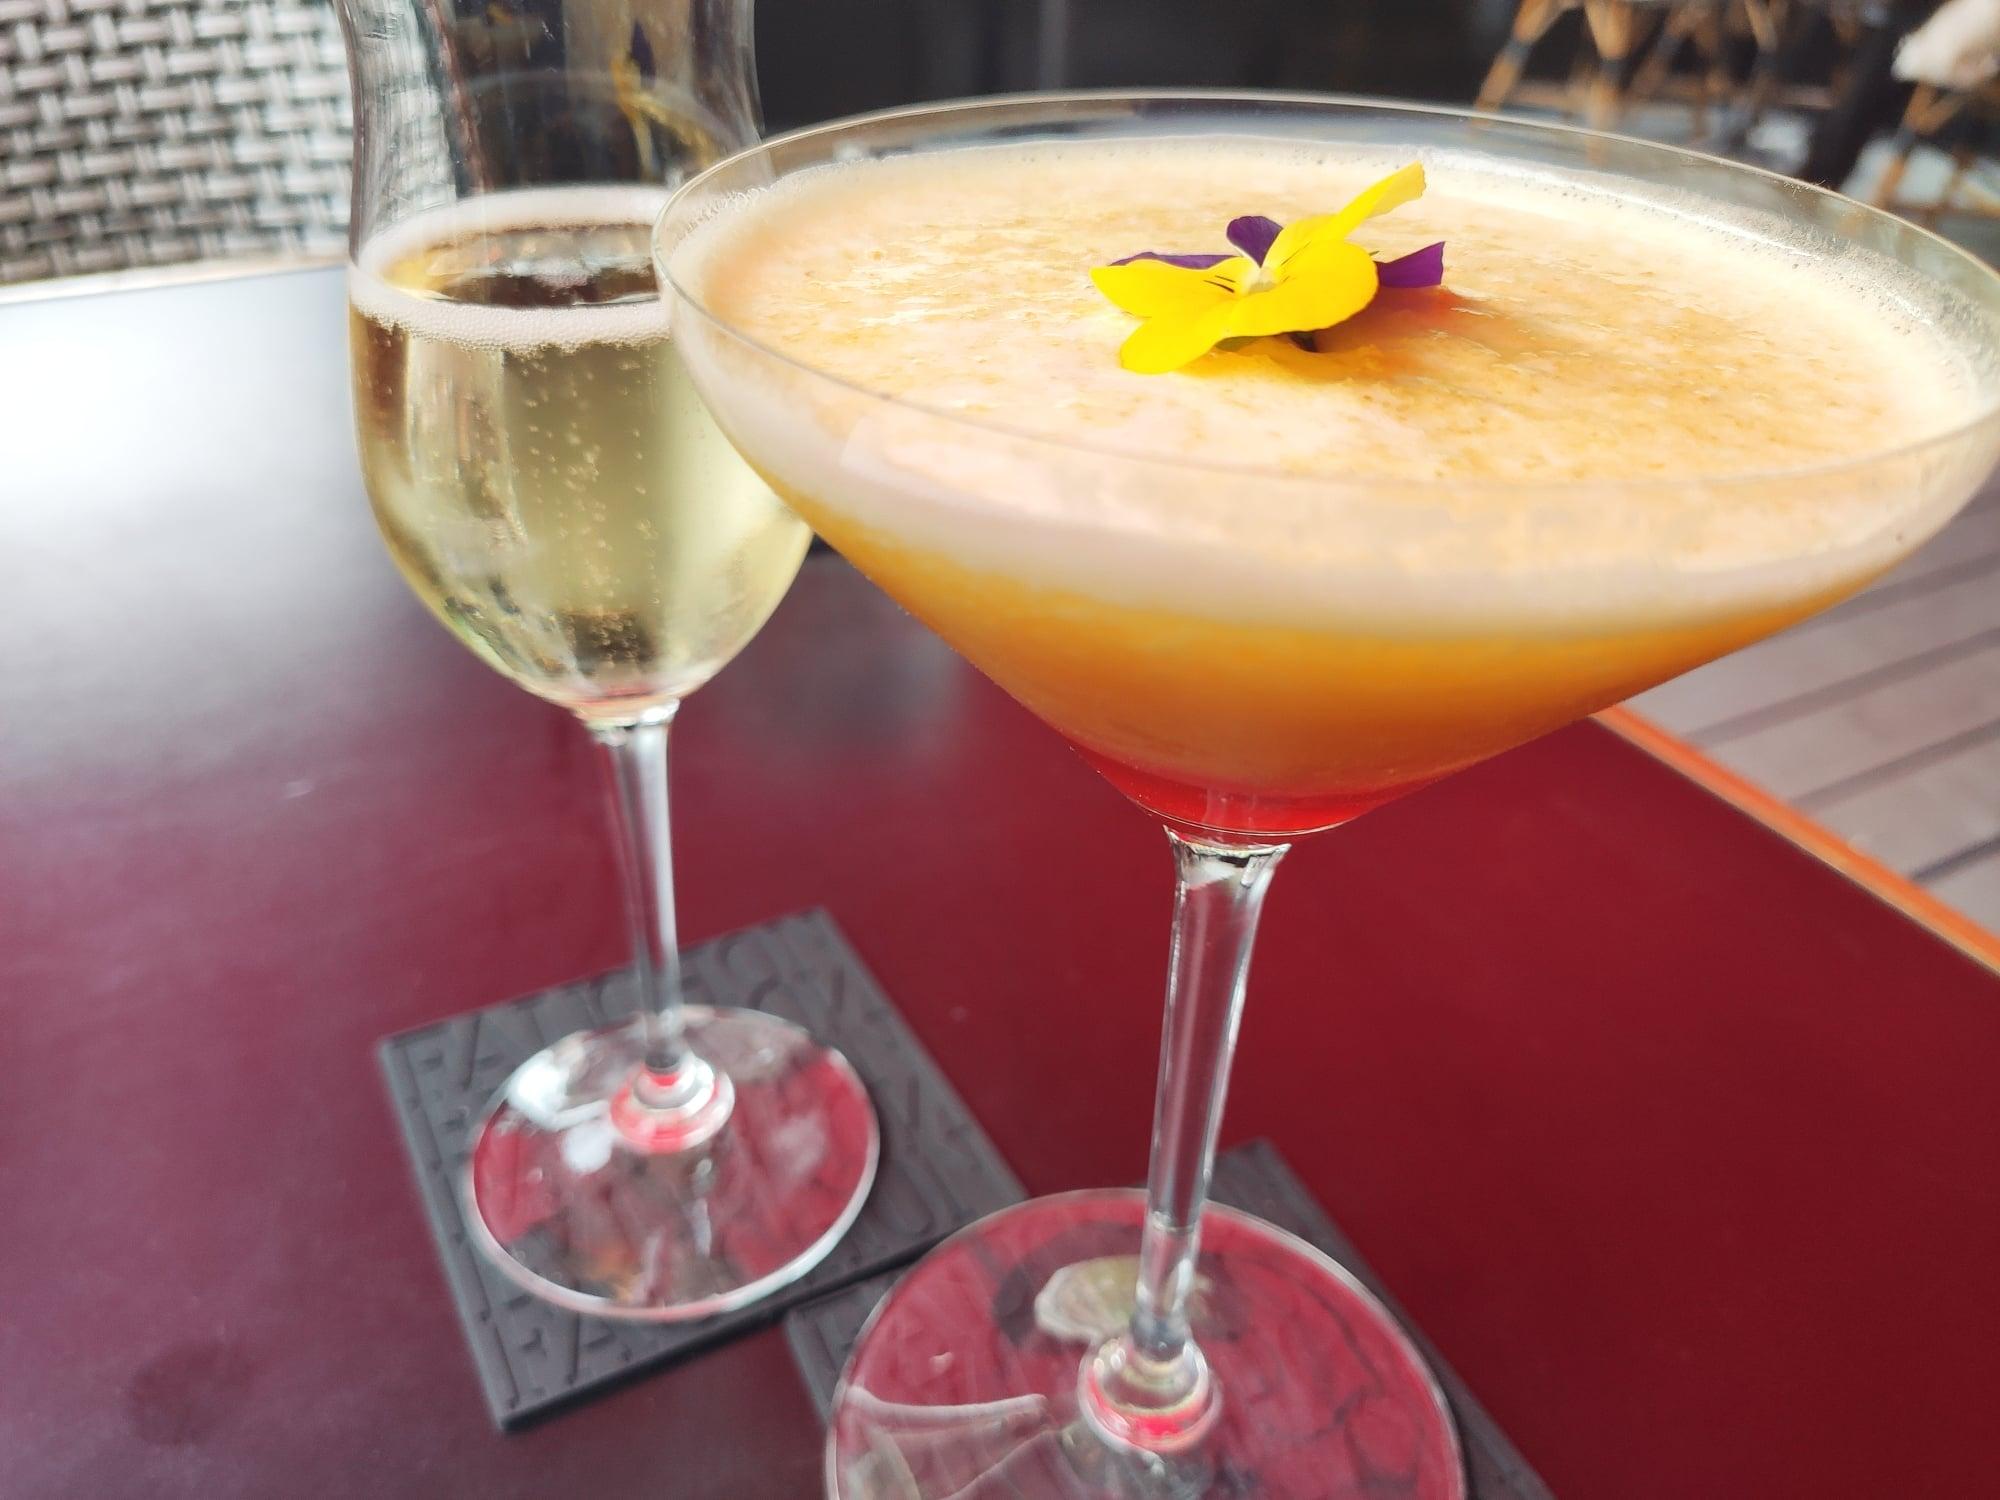 Cocktail - Passion fruit martini - Fauchon l'hotel